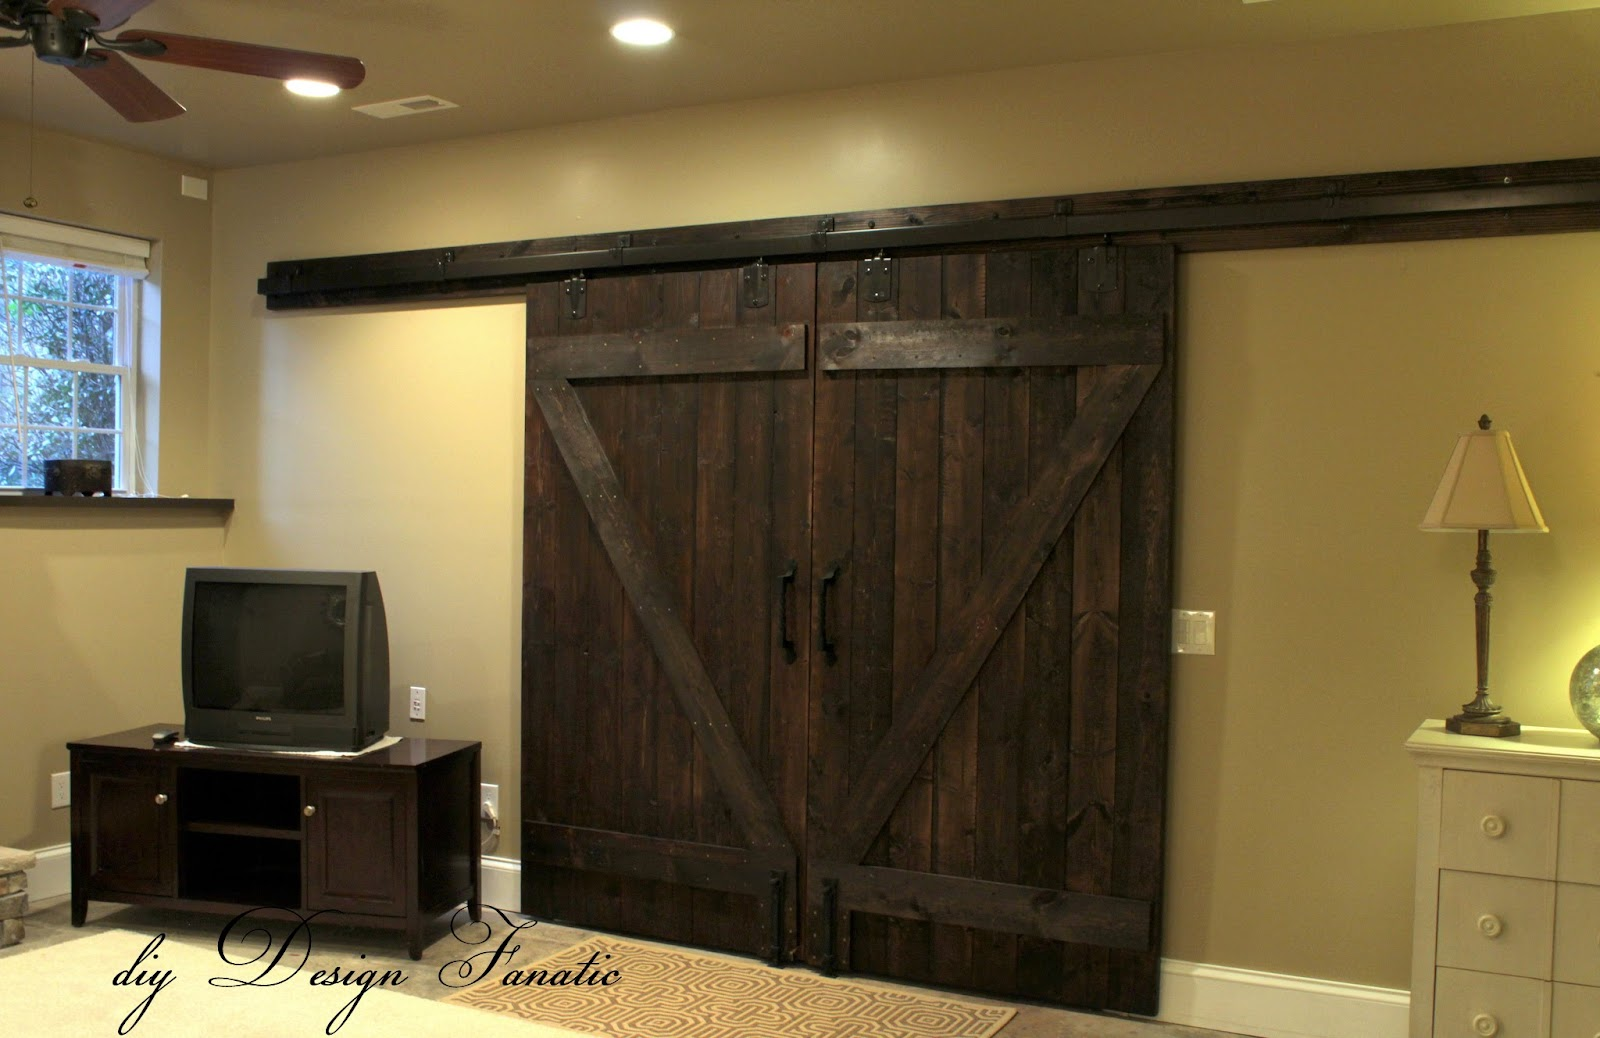 Decorating barn door handles pictures diy Design Fanatic: Barn Doors Completely Finished!